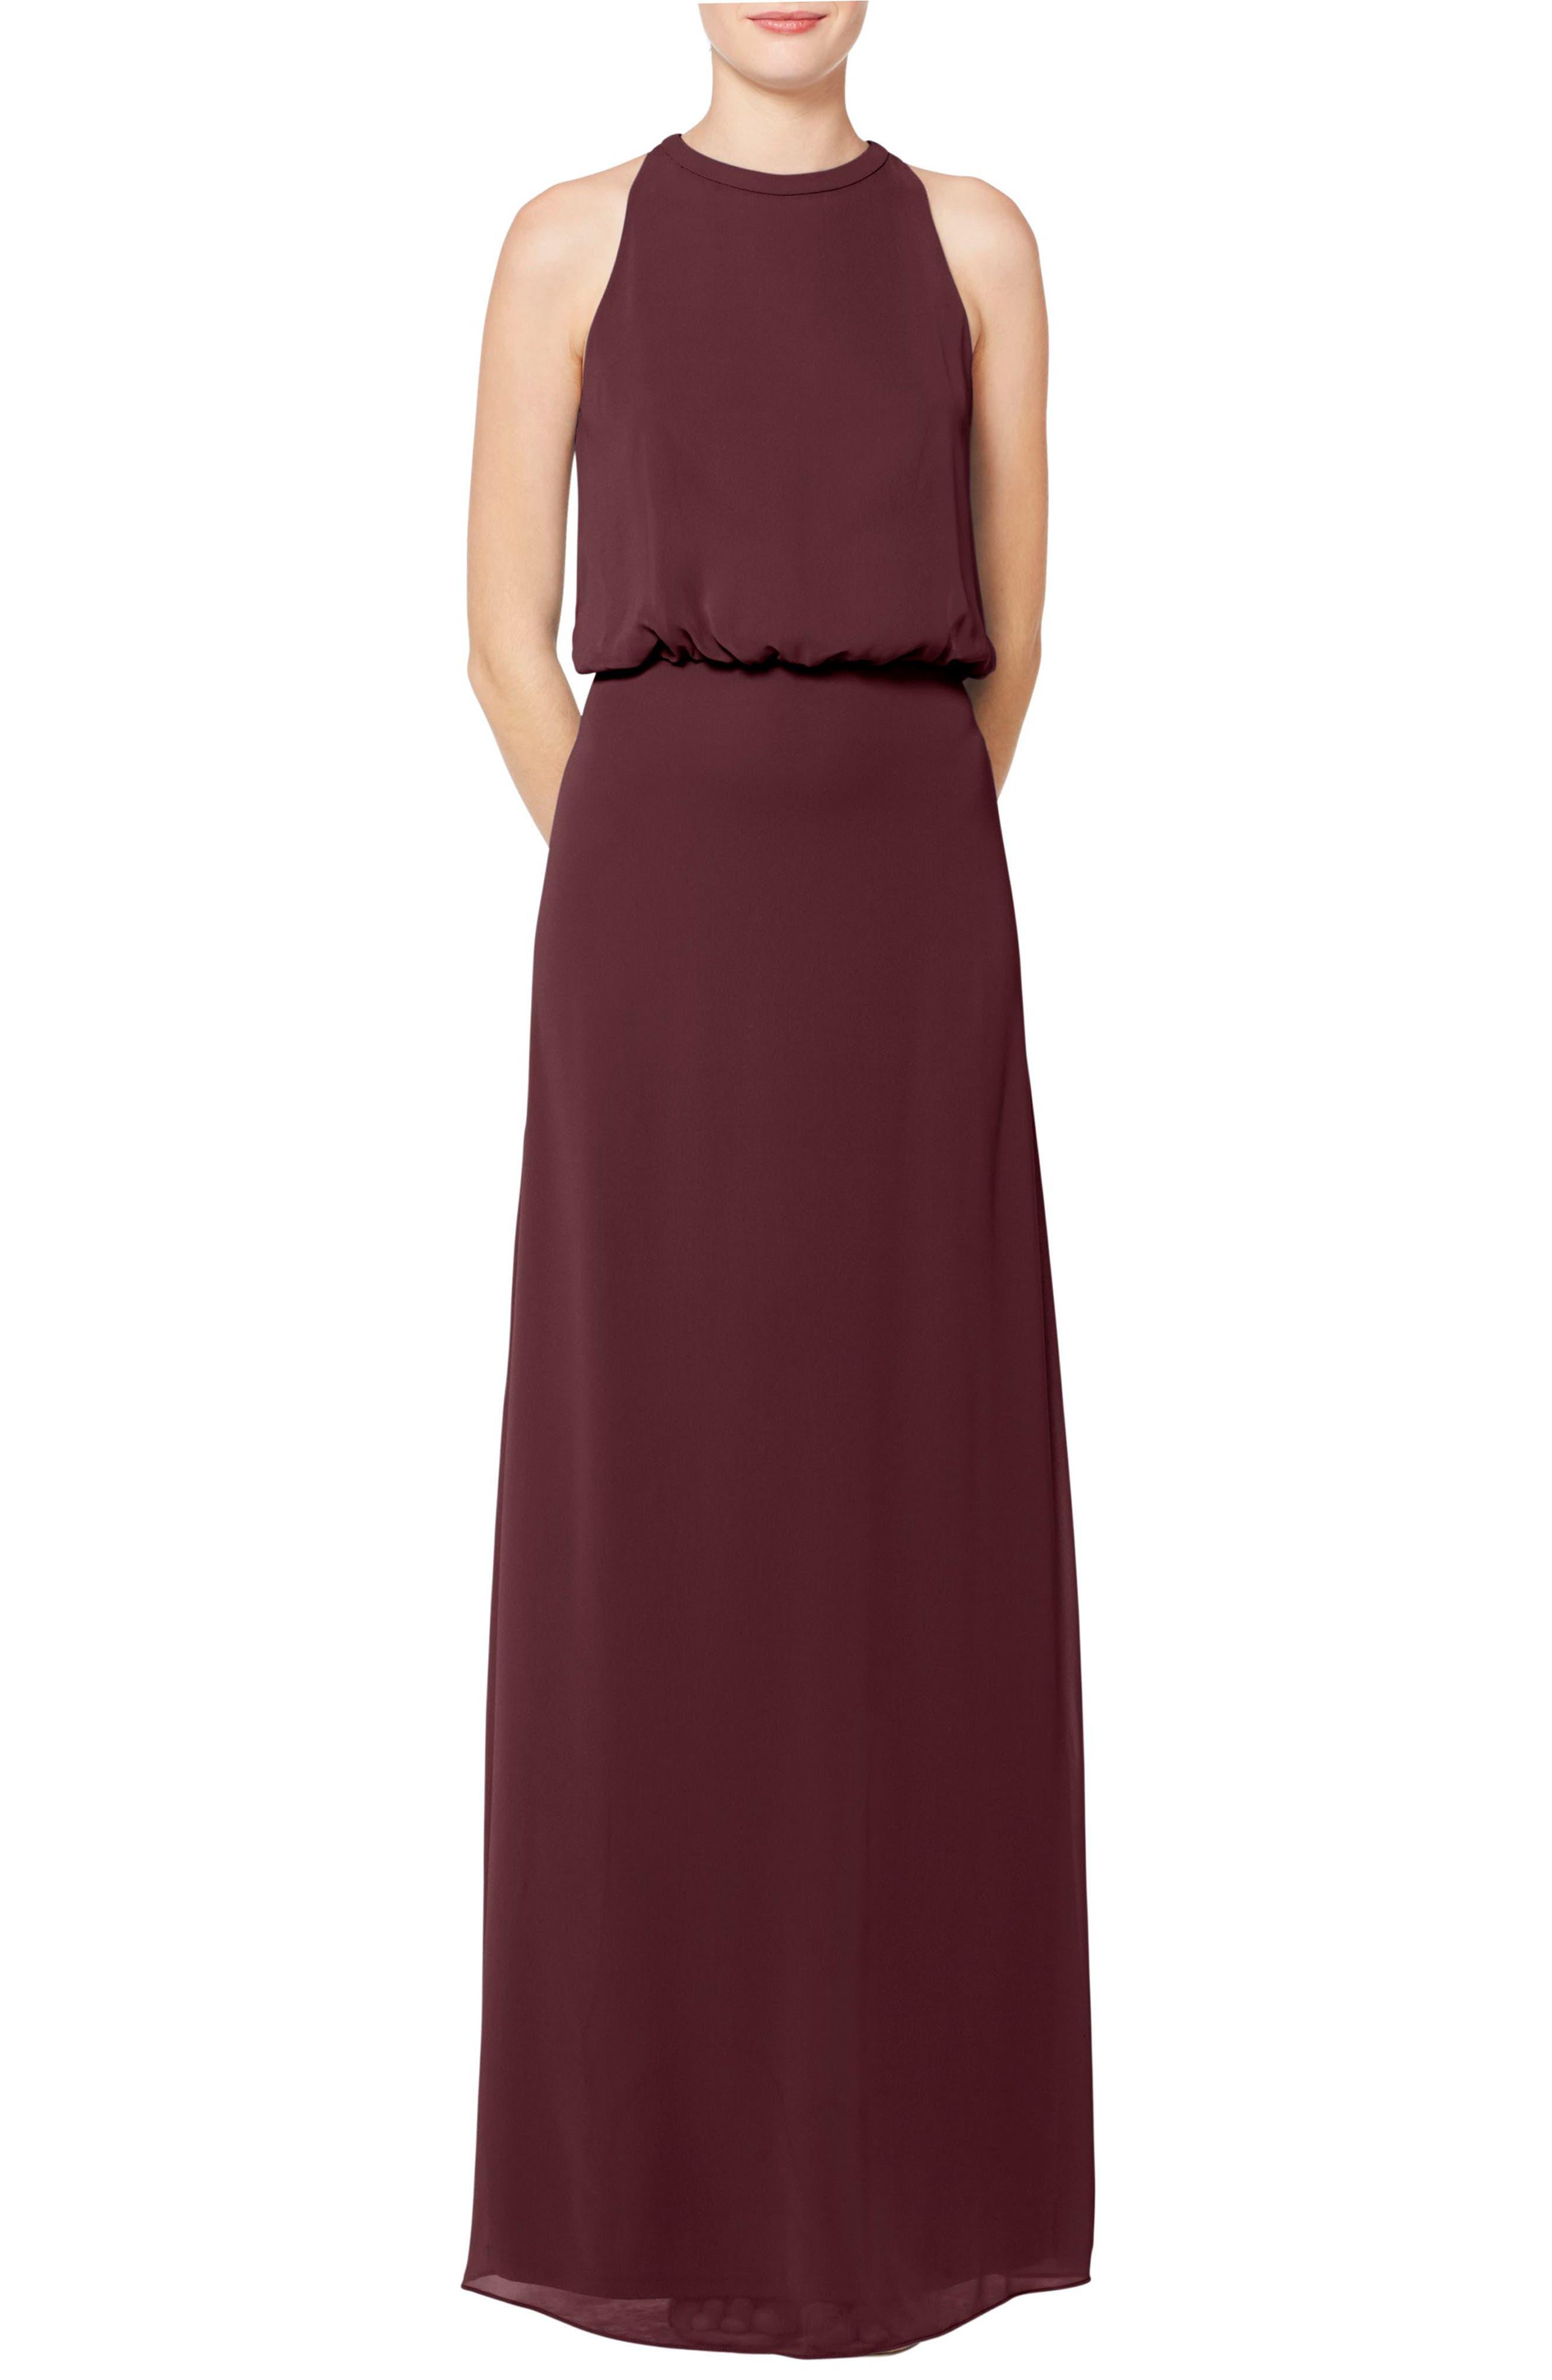 #levkoff Halter Neck Blouson Bodice Chiffon Evening Dress, Burgundy